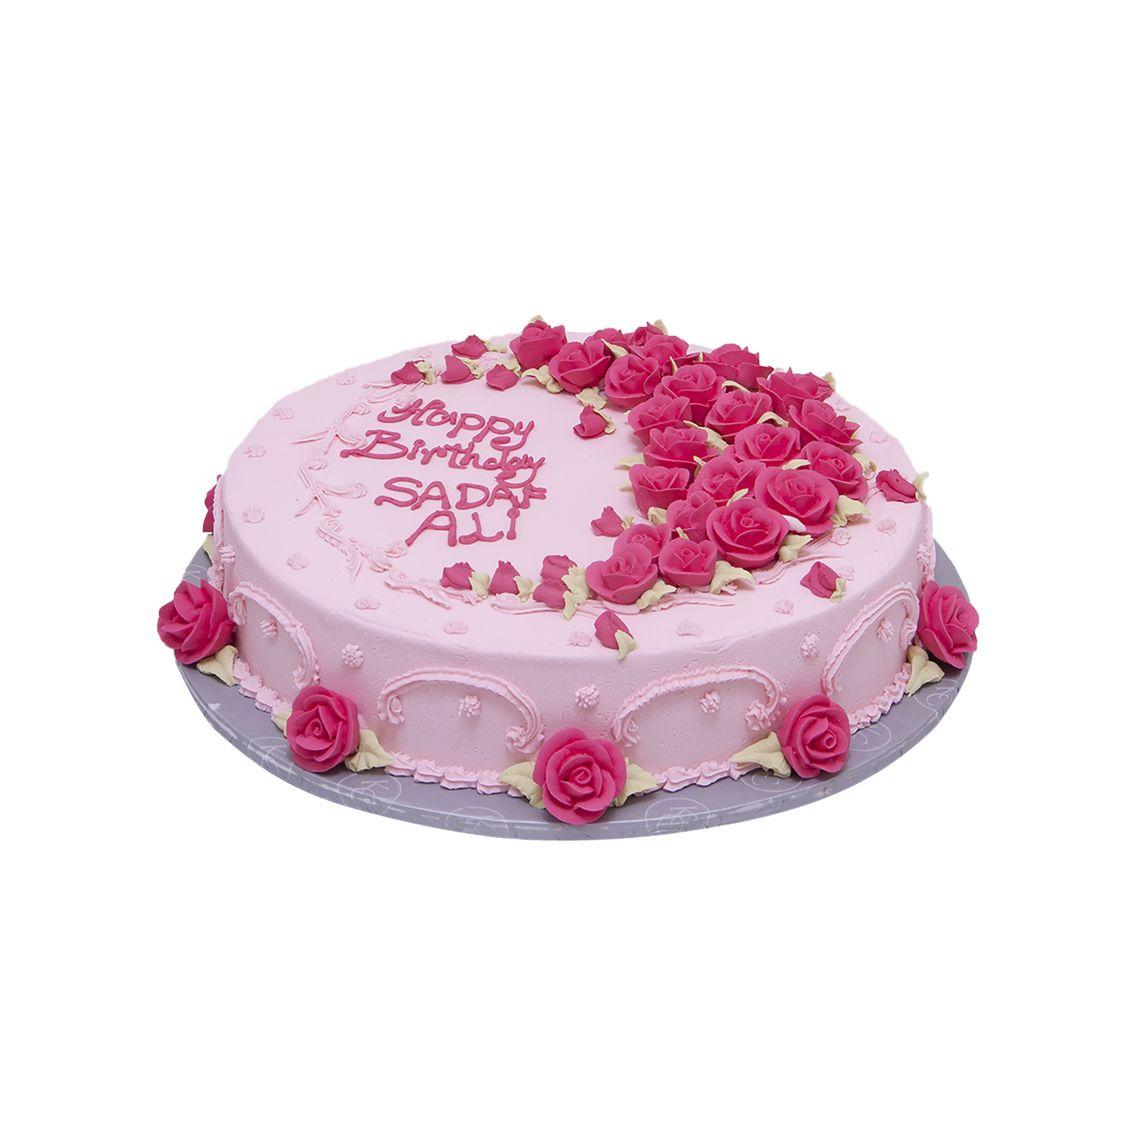 Kitchen Cuisine Default Category Pink Flowers Cake